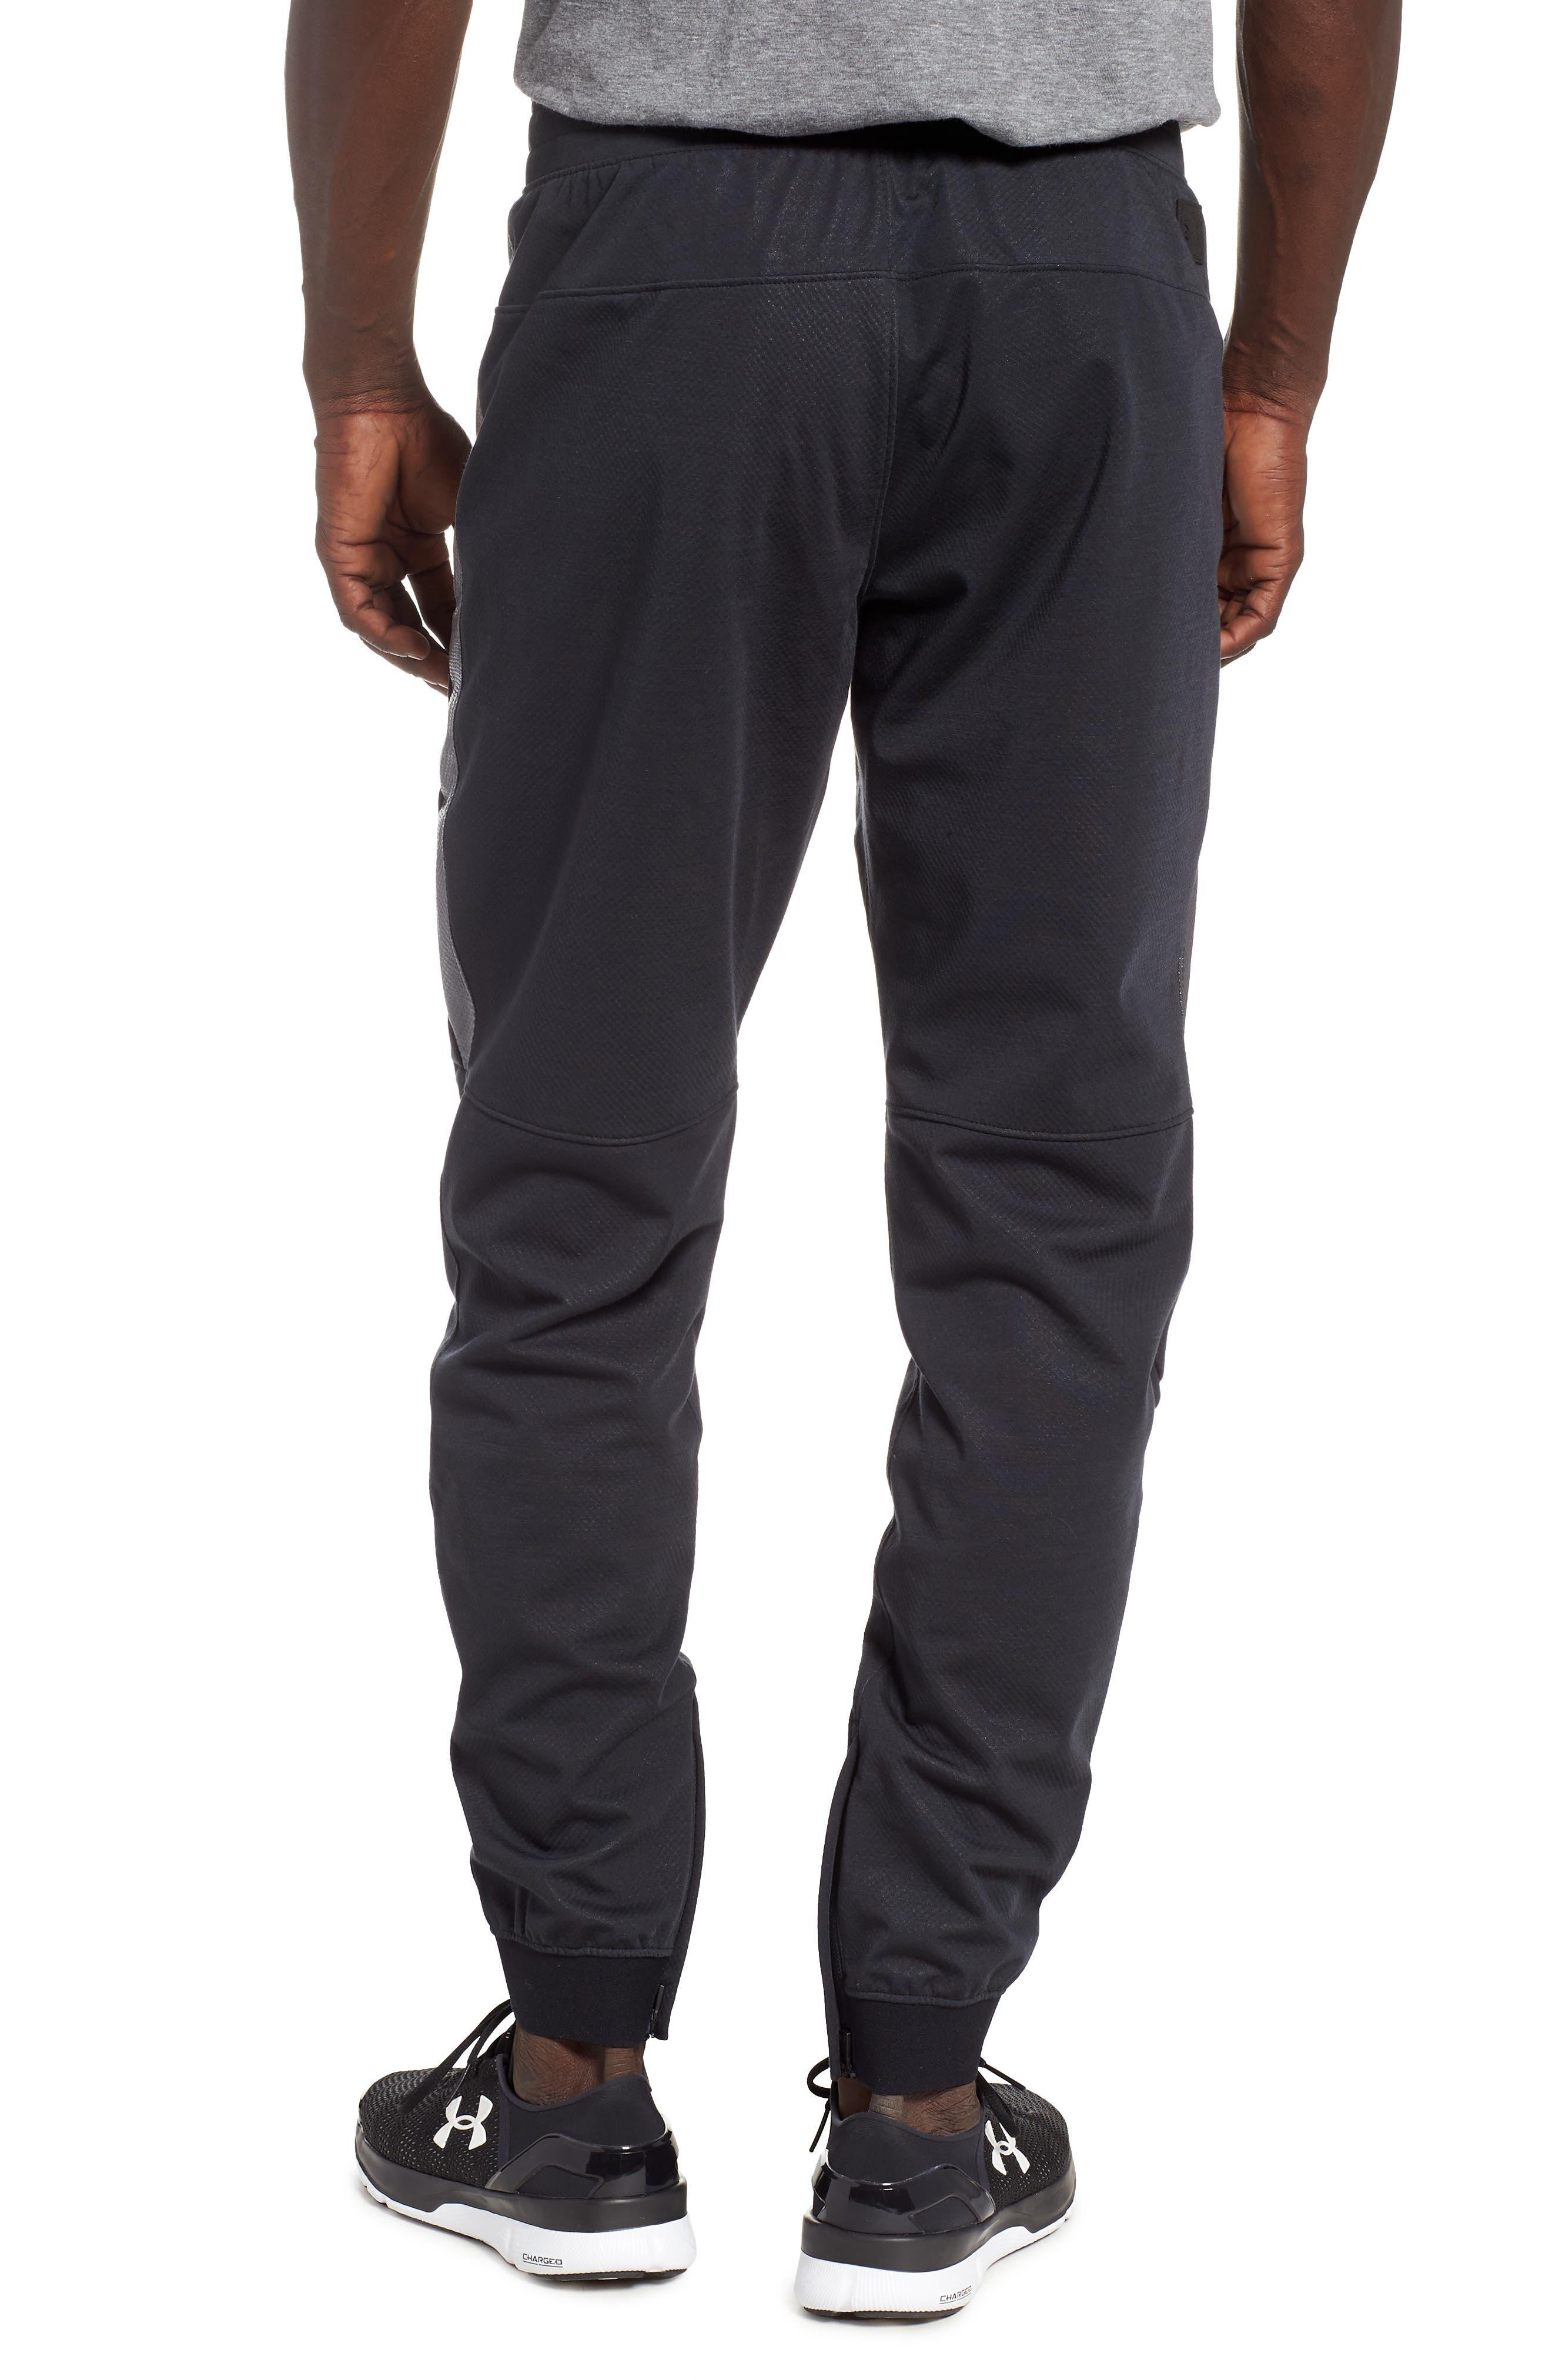 Unstoppable Swacket Training Pants,                             Alternate thumbnail 2, color,                             BLACK FULL HEATHER/ BLACK